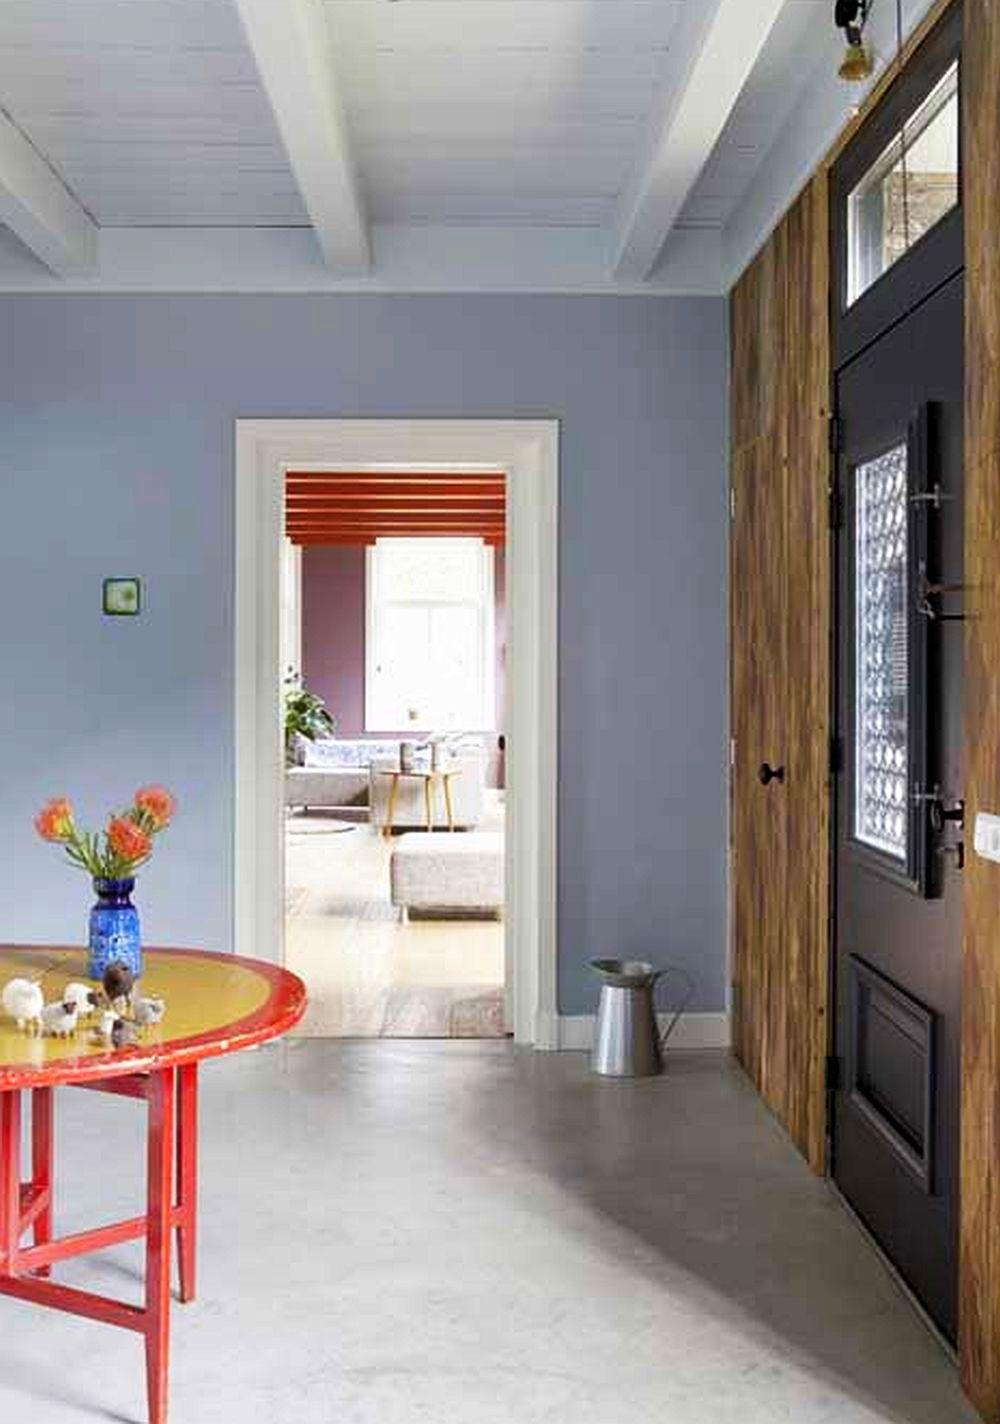 adelaparvu.com about modern farm, designer Larissa van Seumeren, Photo Viva Vida and Living Agency (7)